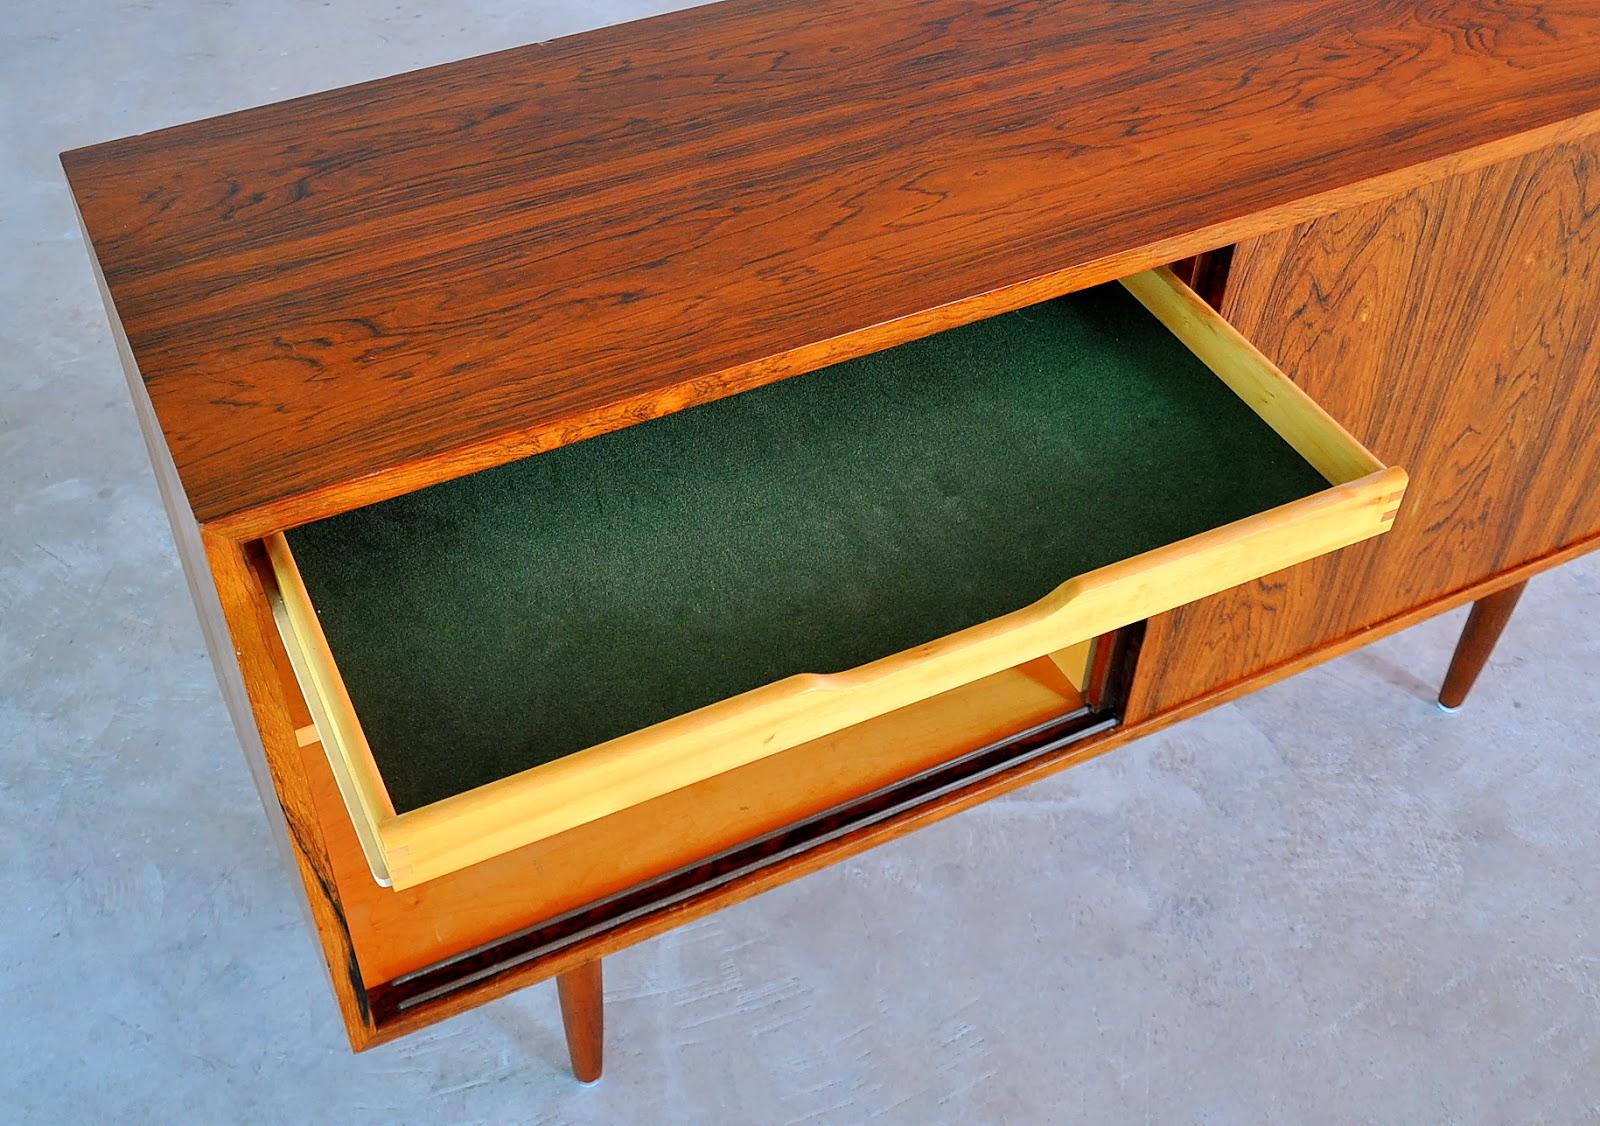 SELECT MODERN Poul Hundevad Rosewood Credenza, Sideboard, Buffet or Bar